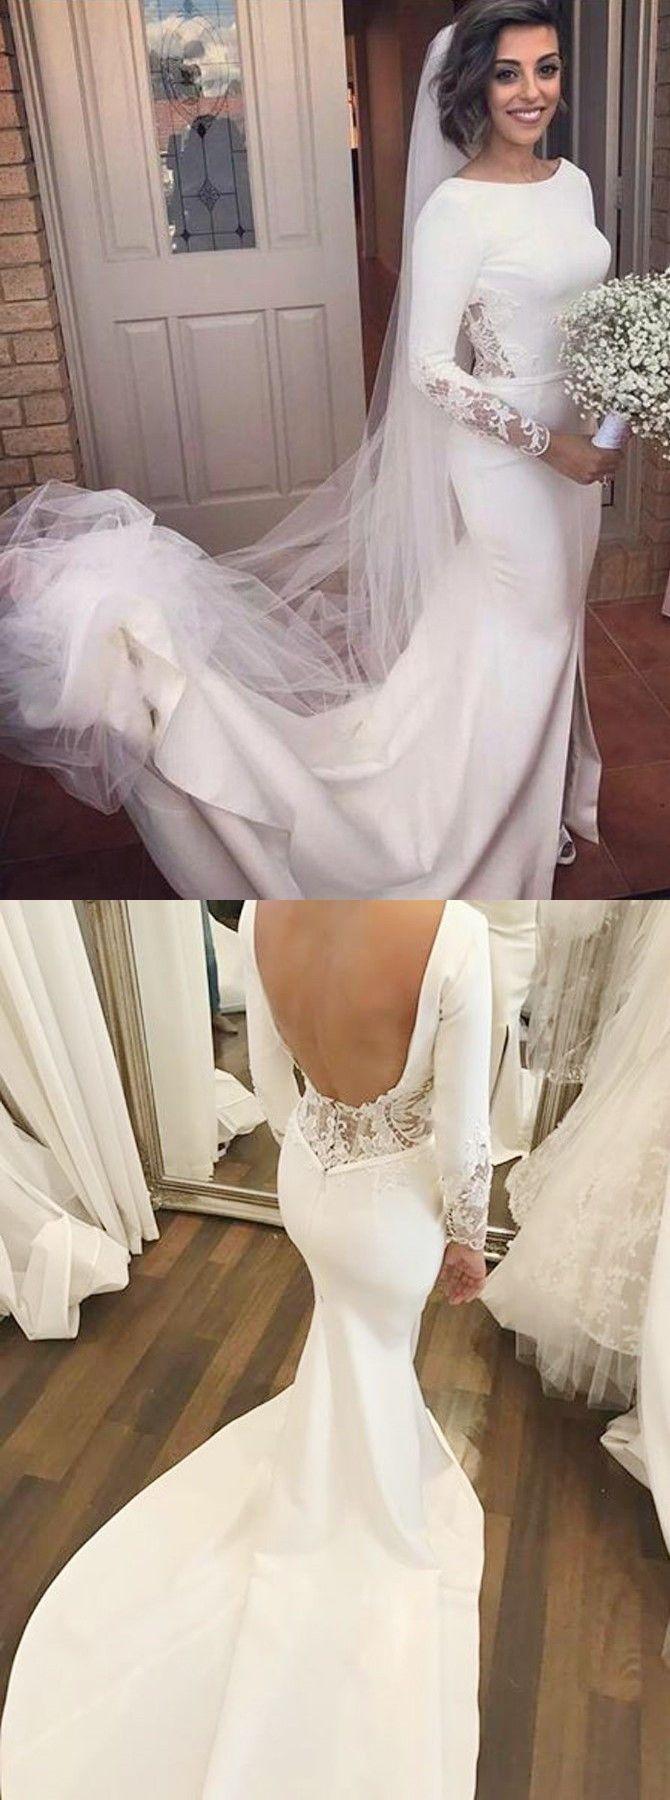 Mermaid bateau backless long sleeves court train wedding dress with